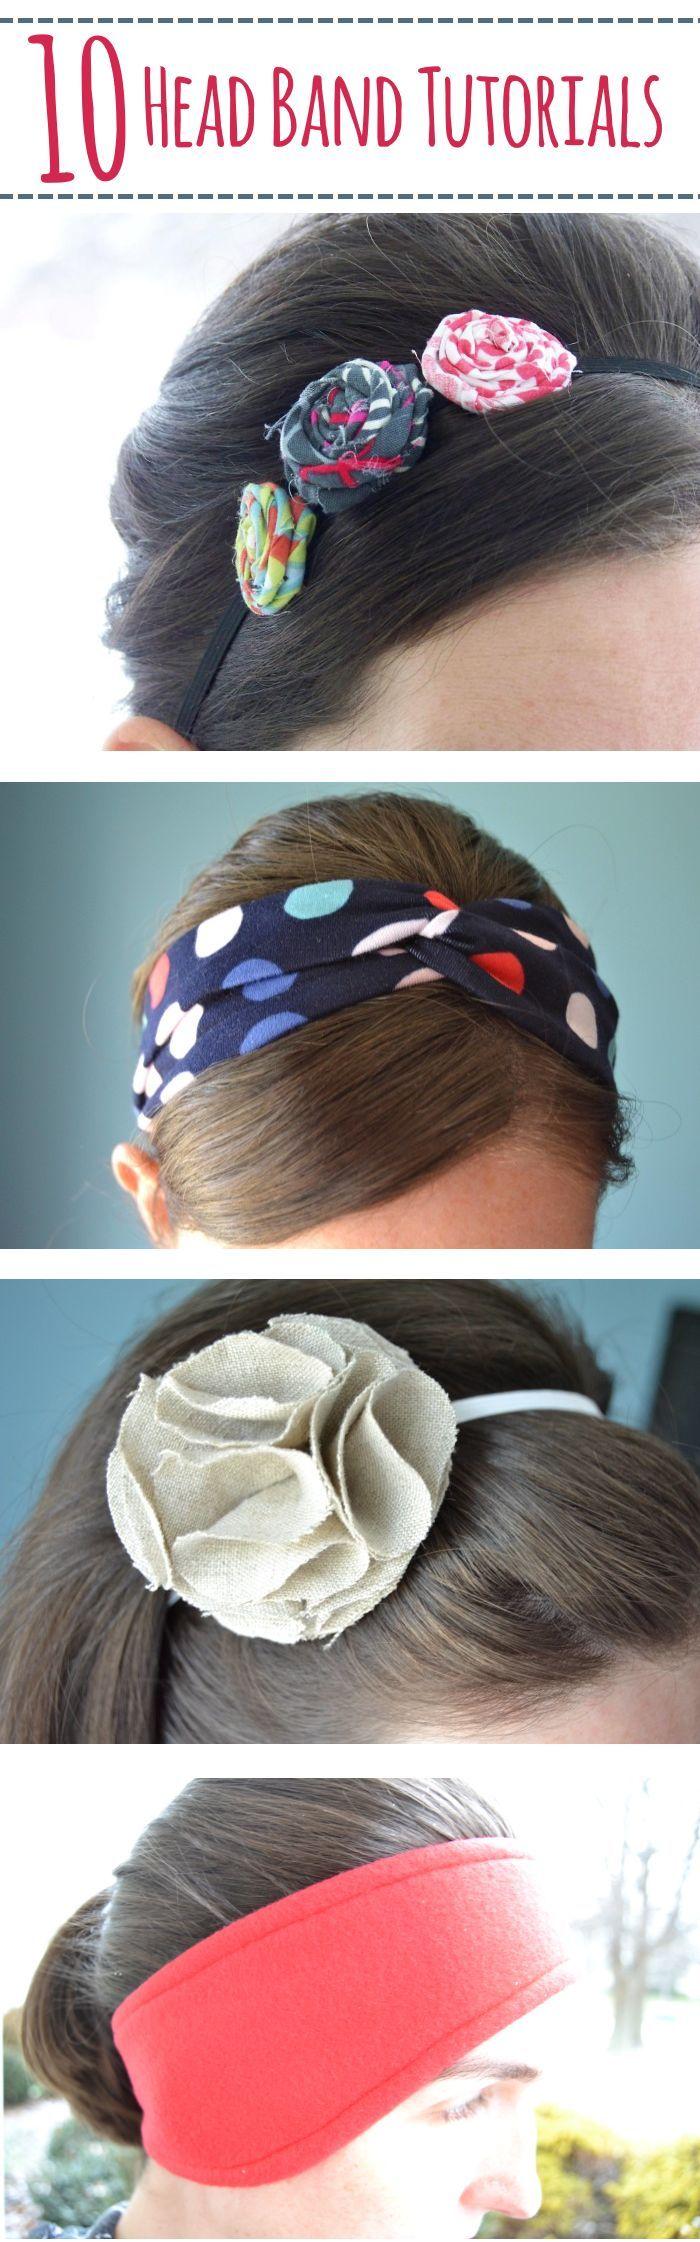 10 Headband Tutorials – Mary Martha Mama- 10 DIY head band tutorials- some no-sew, some sewing, knit, felt